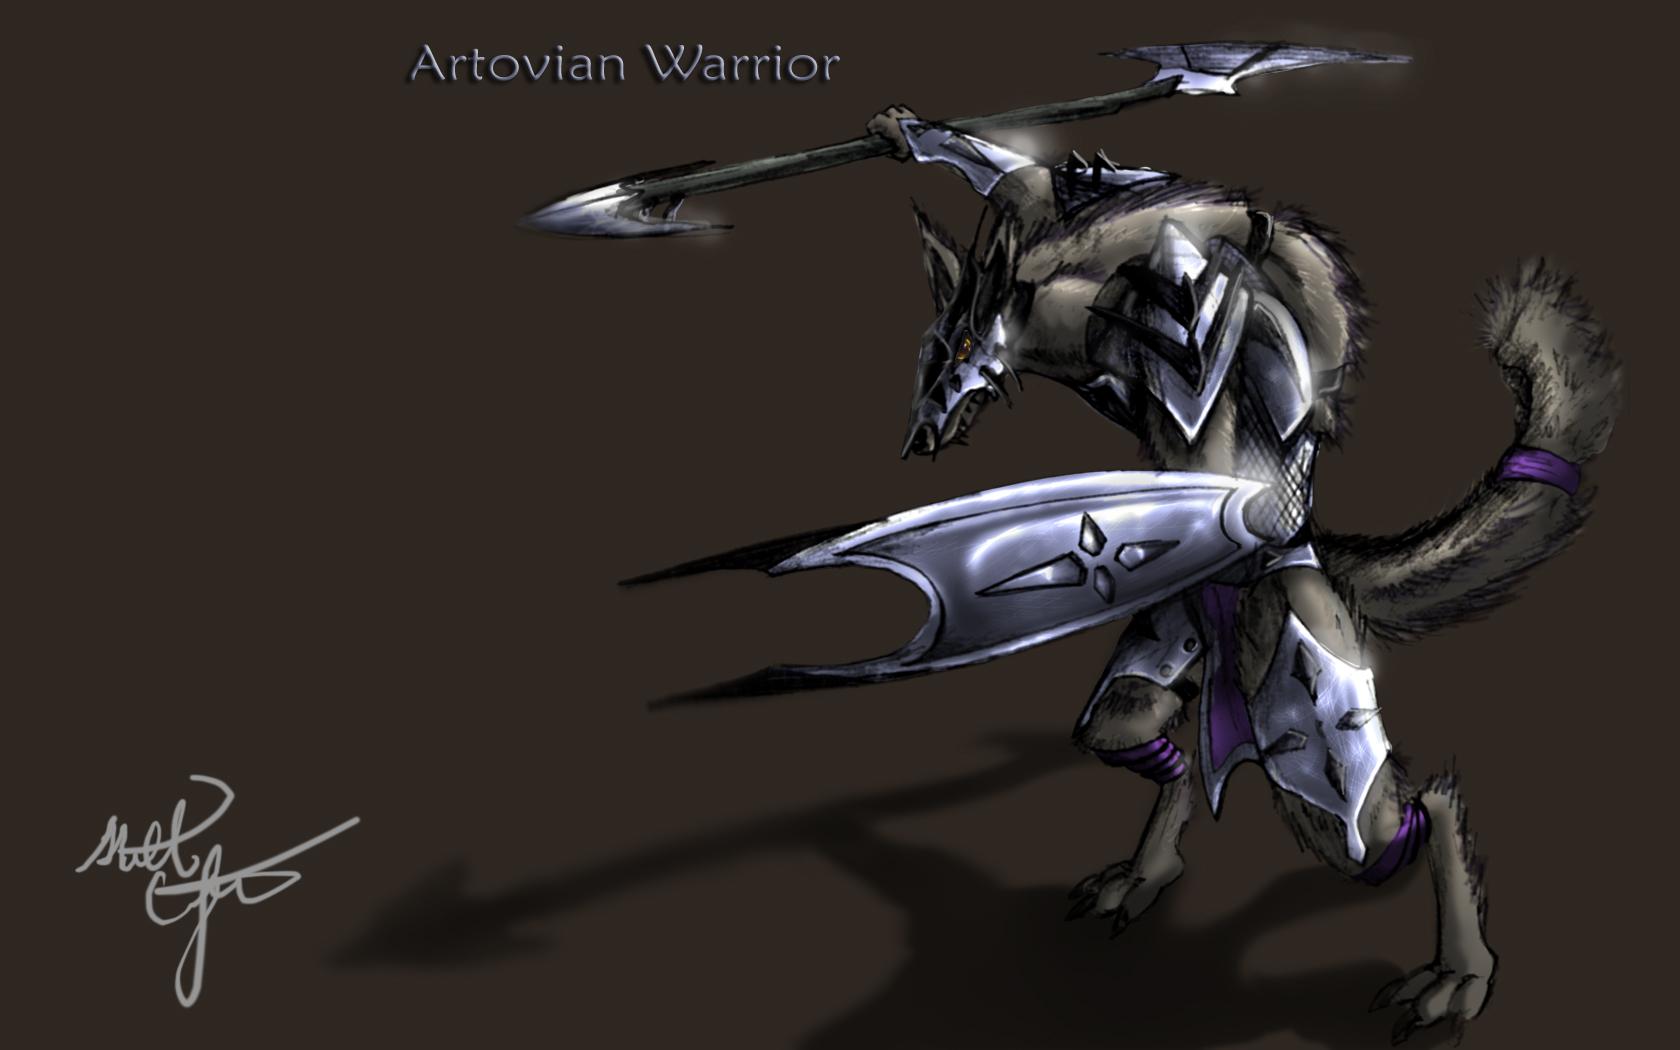 Artovian warrior